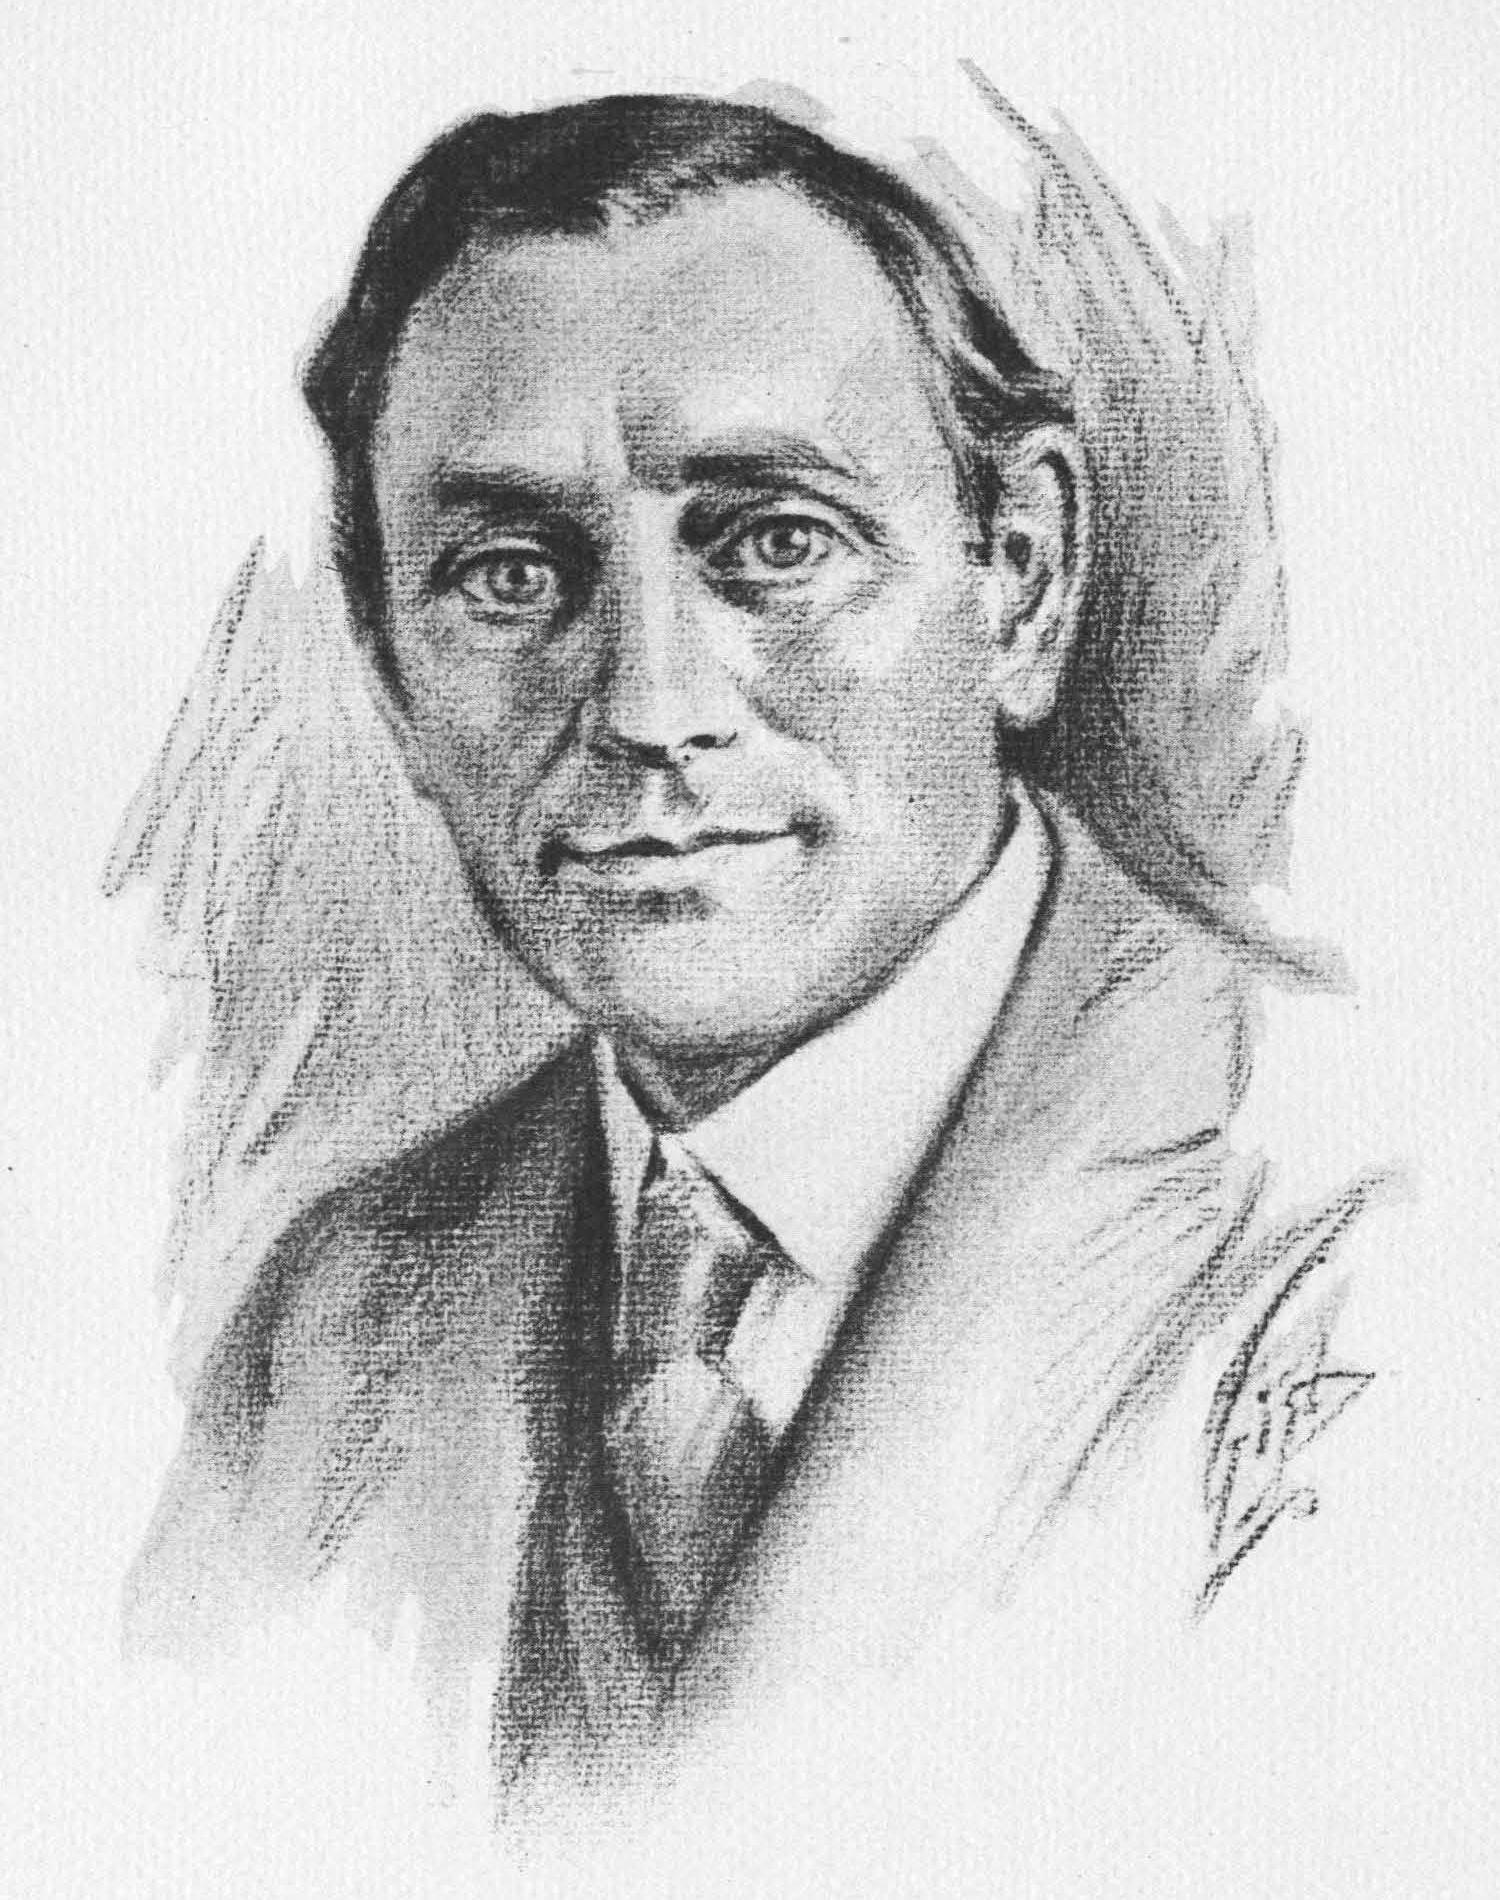 1931 drawing of Harry Bateman